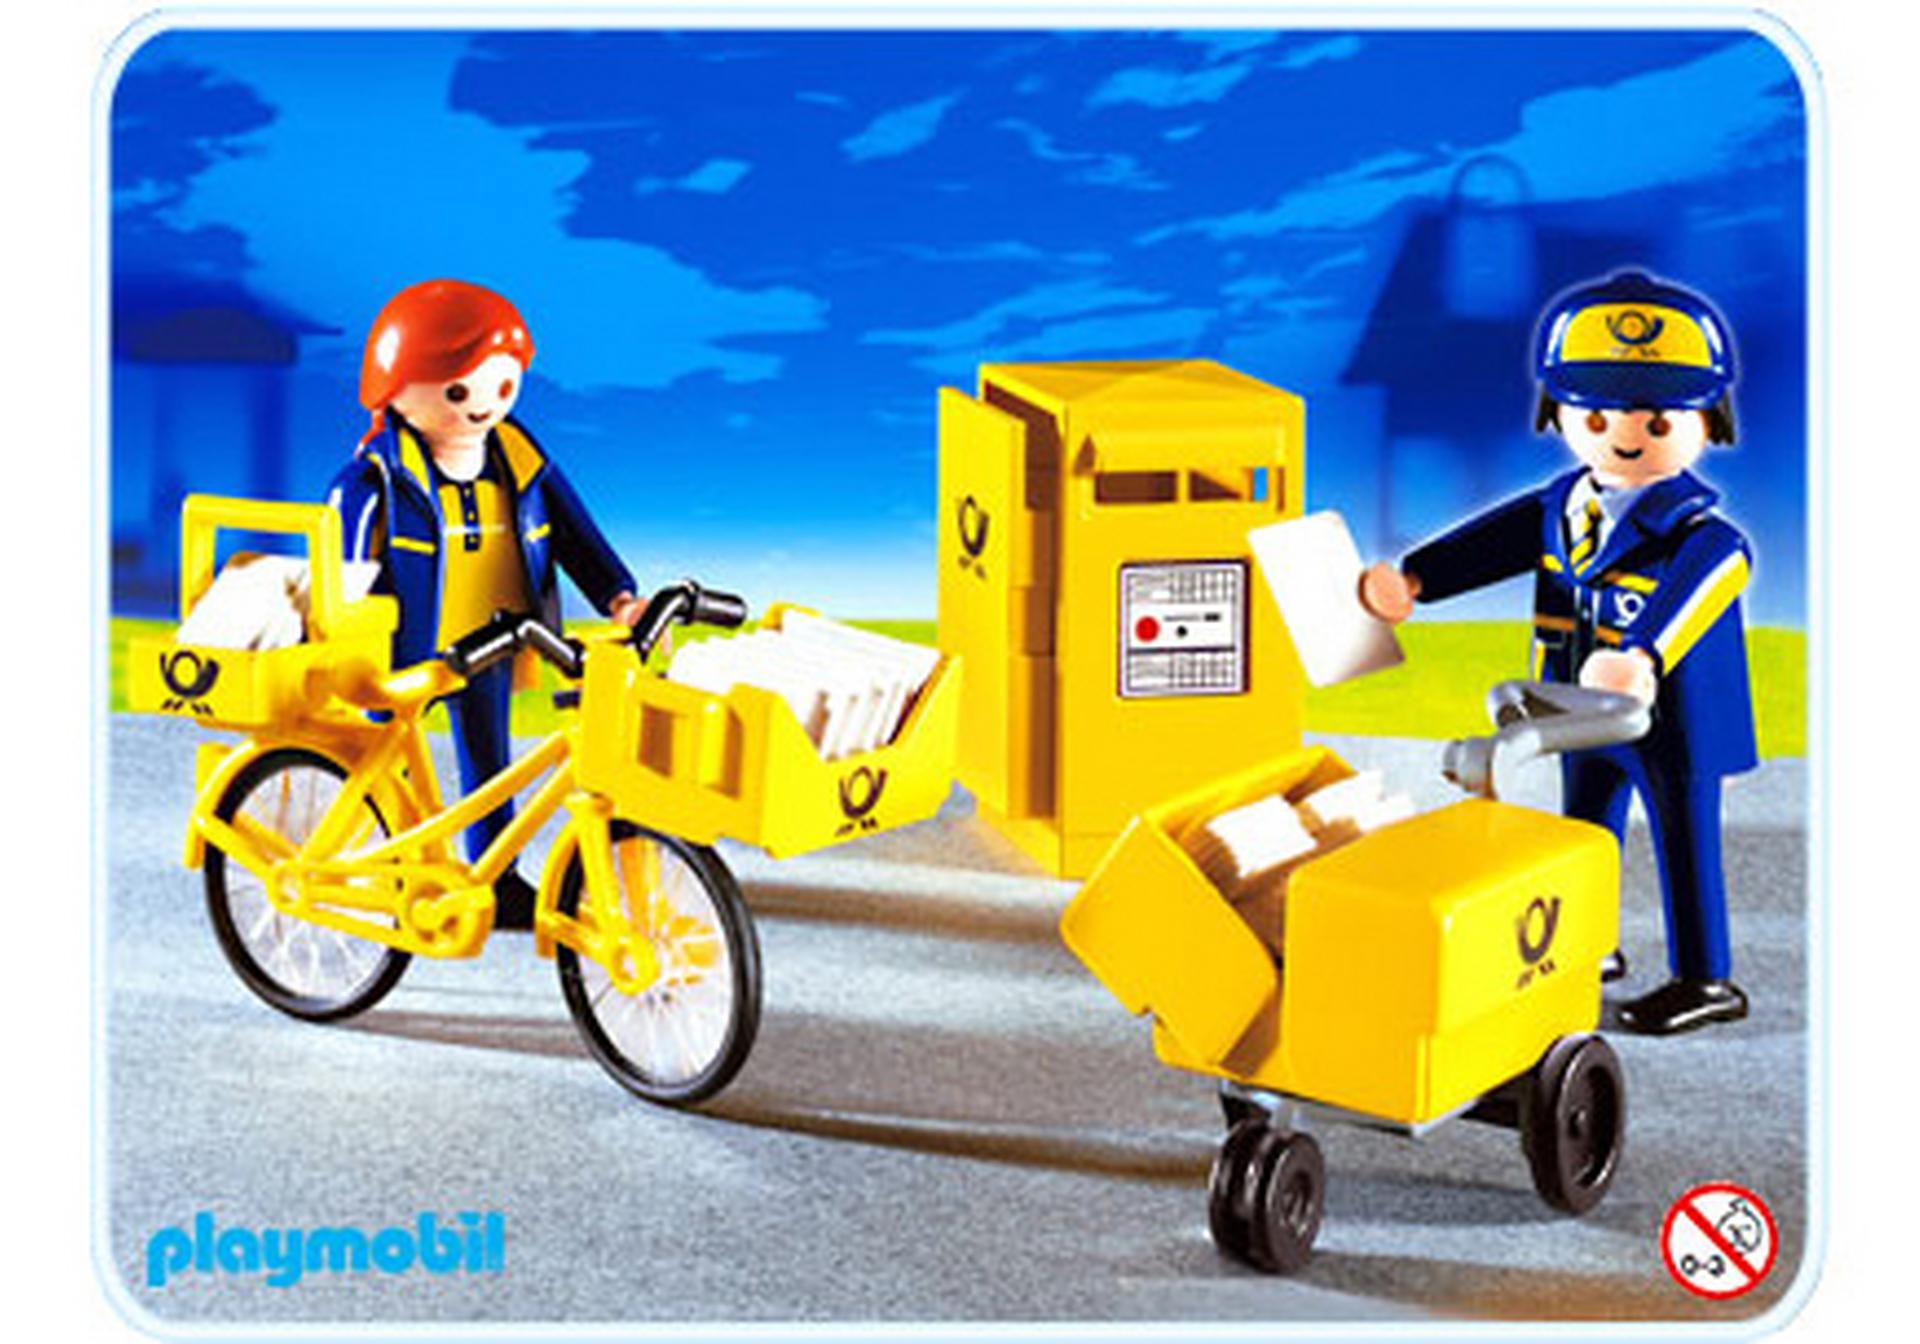 Brieftr ger team 4403 a playmobil deutschland for Jugendzimmer playmobil